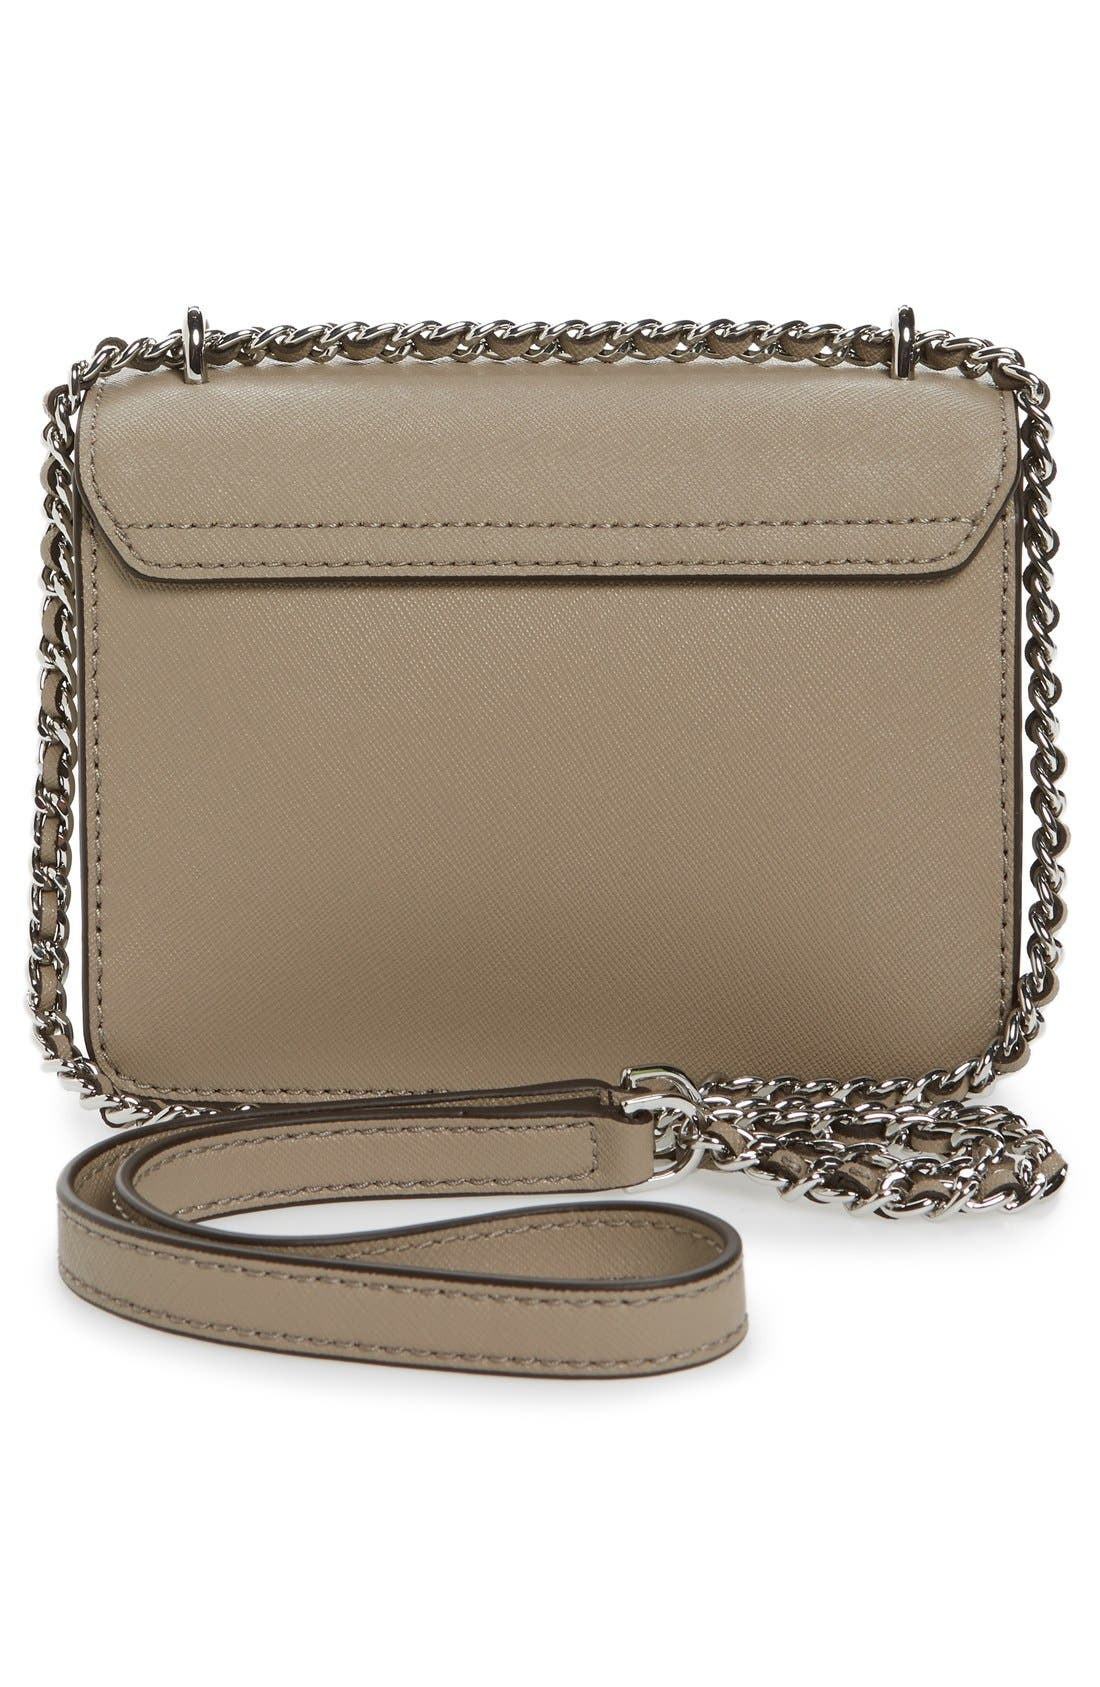 Mini Robinson Convertible Leather Shoulder Bag,                             Alternate thumbnail 2, color,                             036